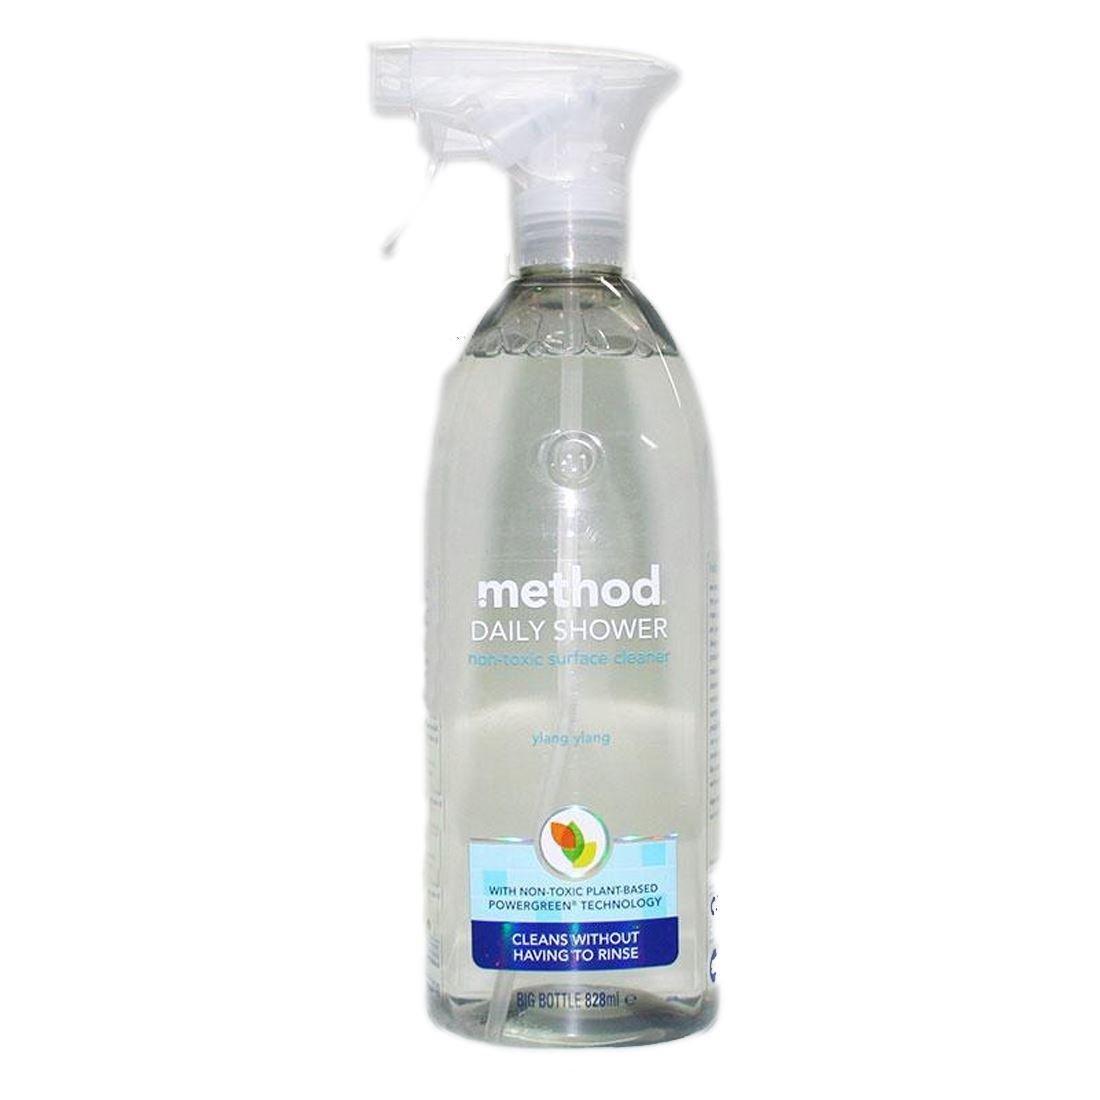 Method Daily Shower Spray detergente per superficie della doccia, 828ml Grocery